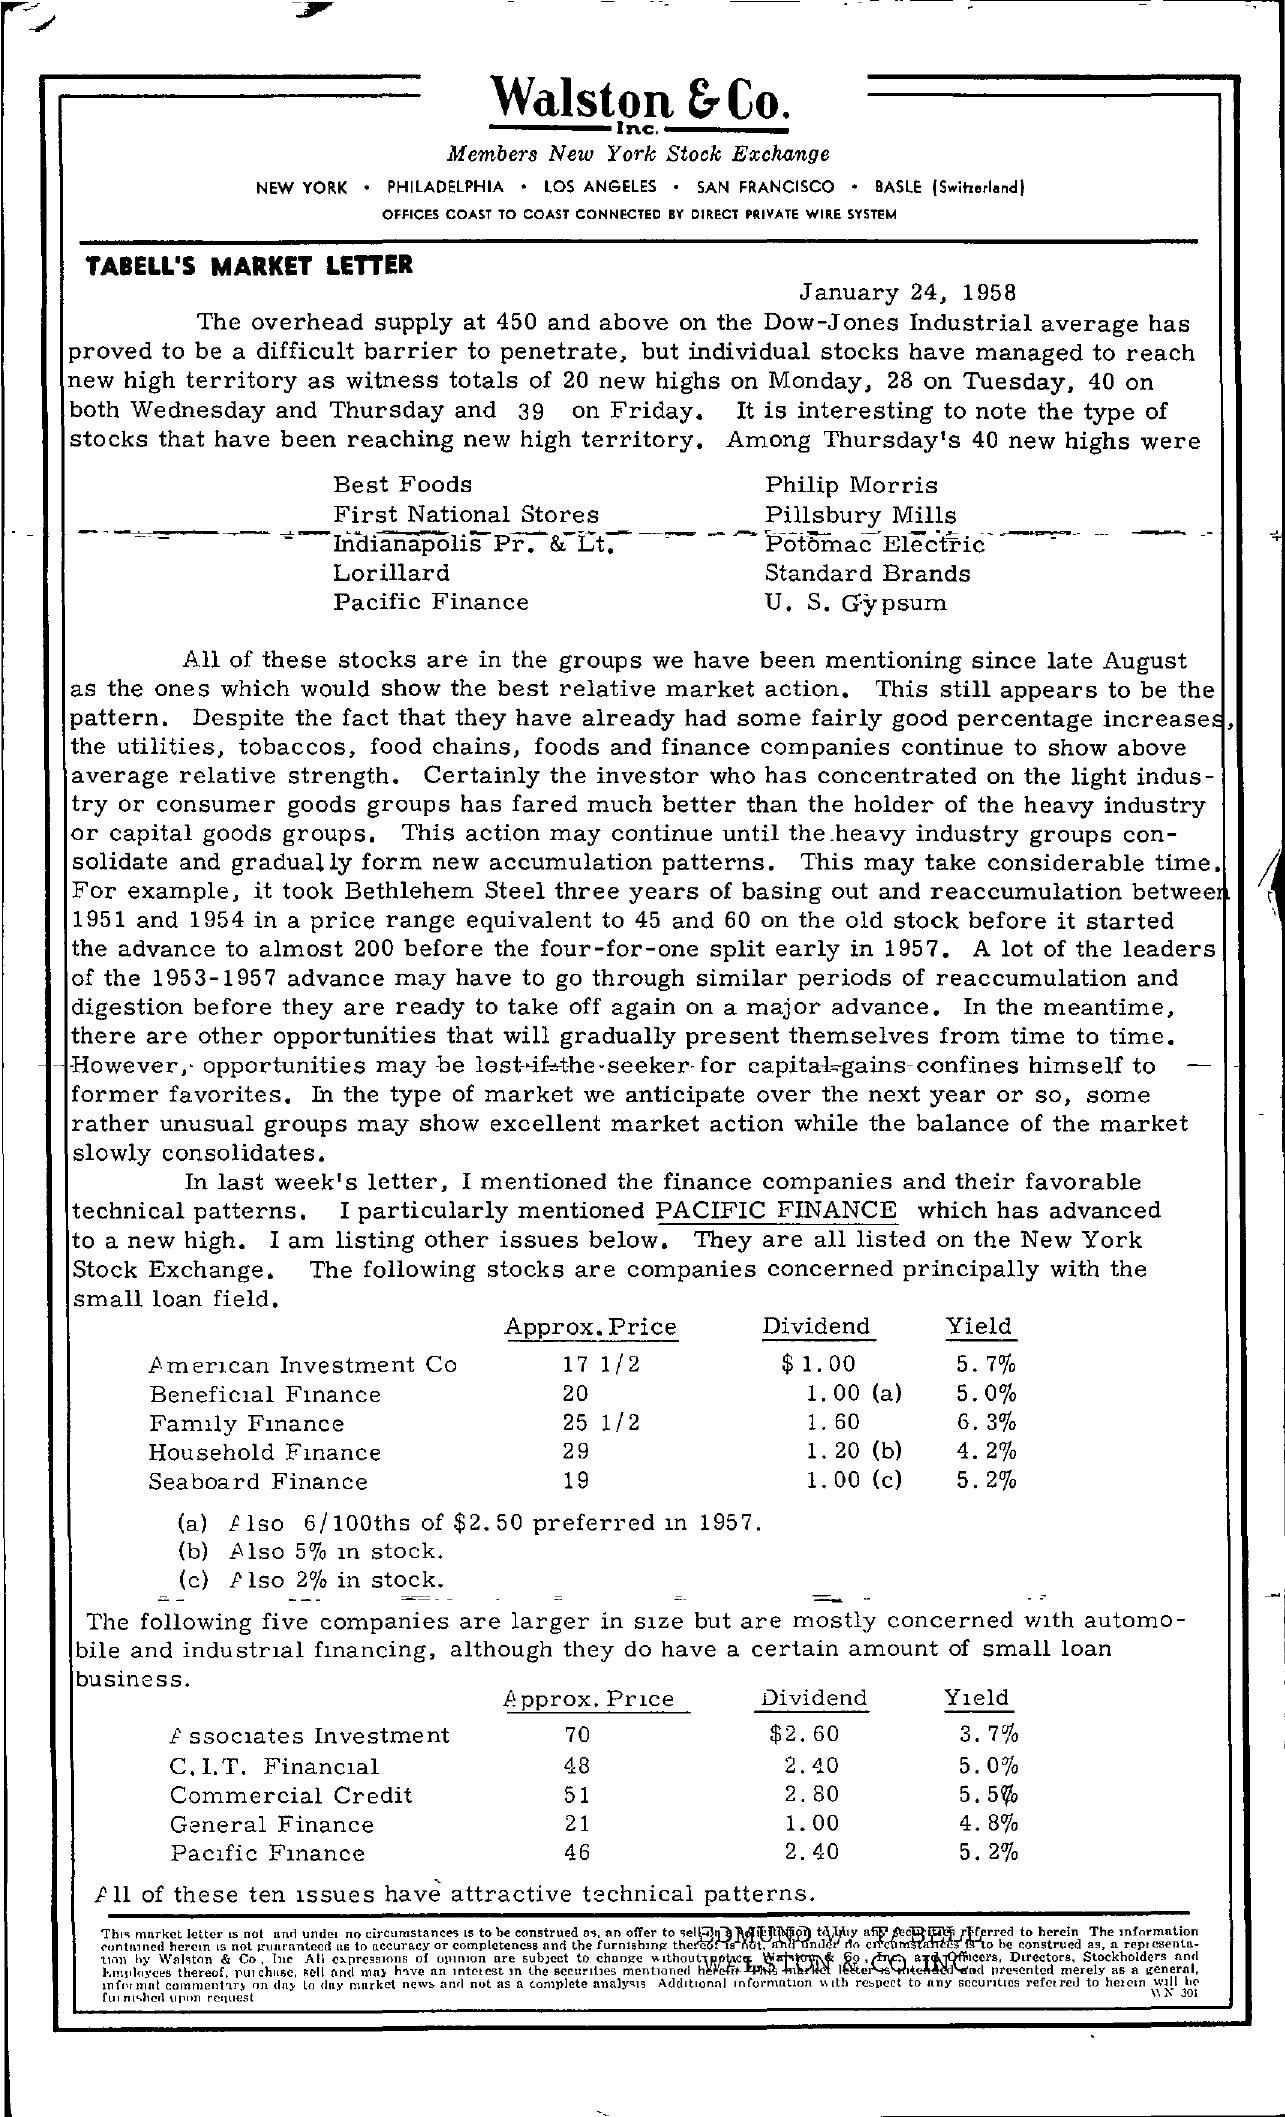 Tabell's Market Letter - January 24, 1958